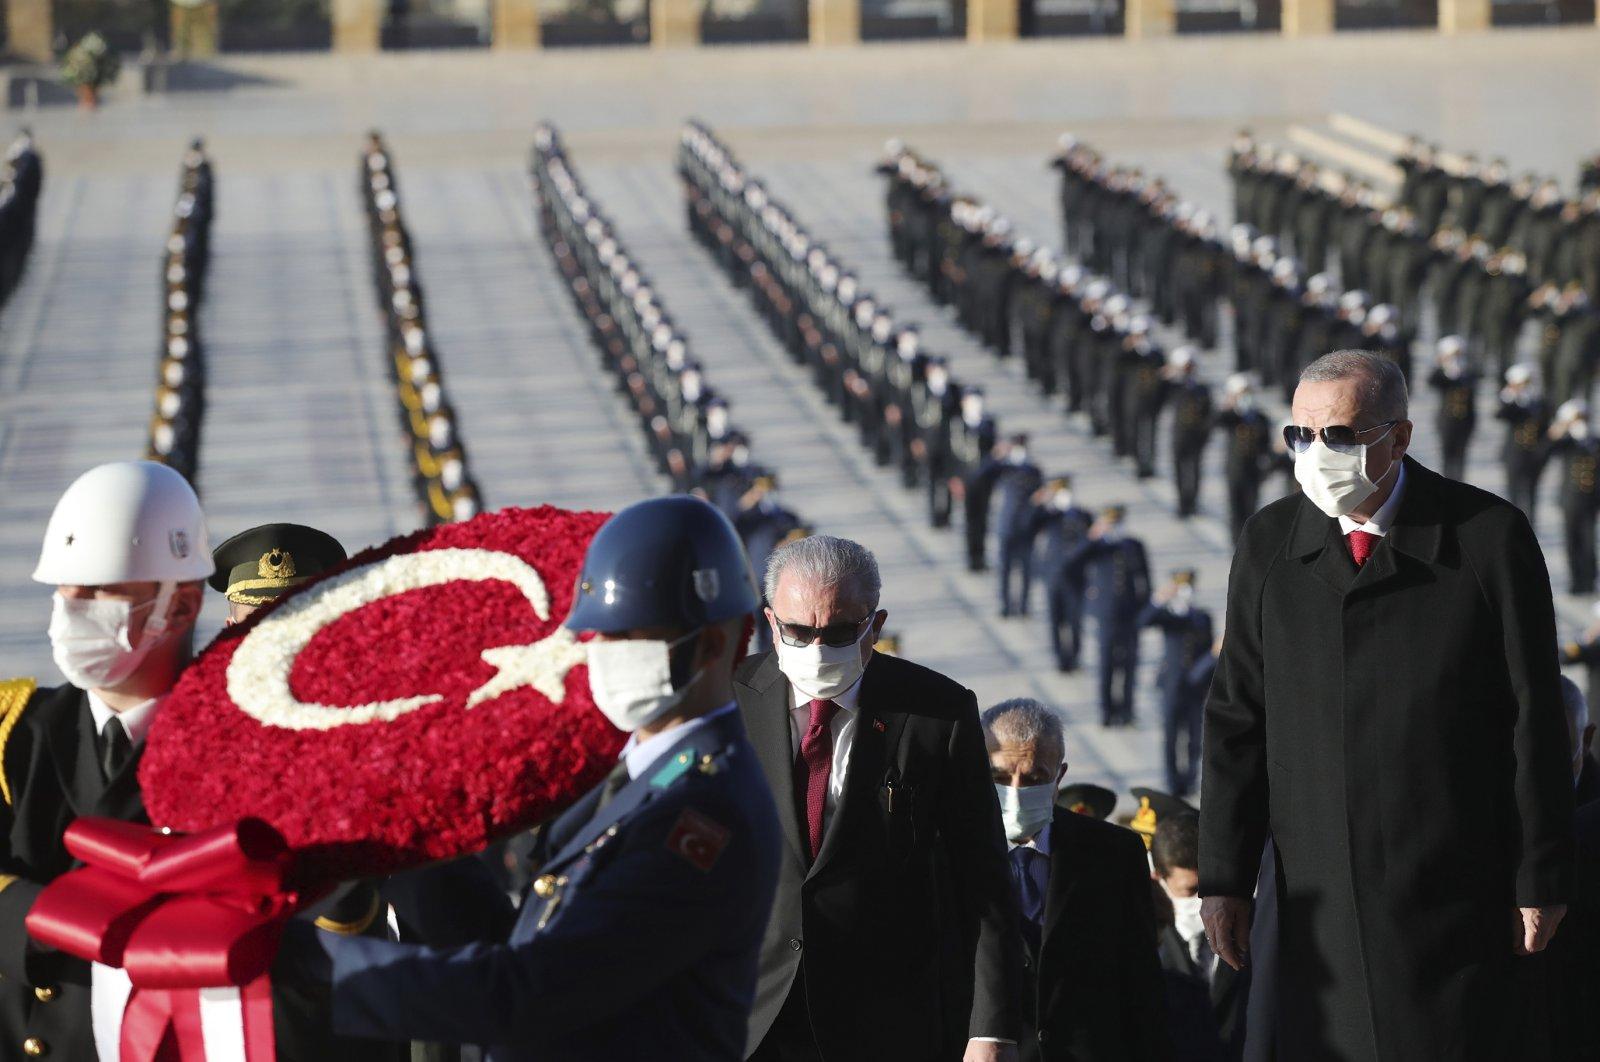 President Recep Tayyip Erdoğan (R) and other Turkish political leaders visit the mausoleum of modern Turkey's founder, Mustafa Kemal Atatürk, during a memorial ceremony on the 82nd anniversary of his death, in Ankara, Turkey, Nov. 10, 2020. (AP Photo)